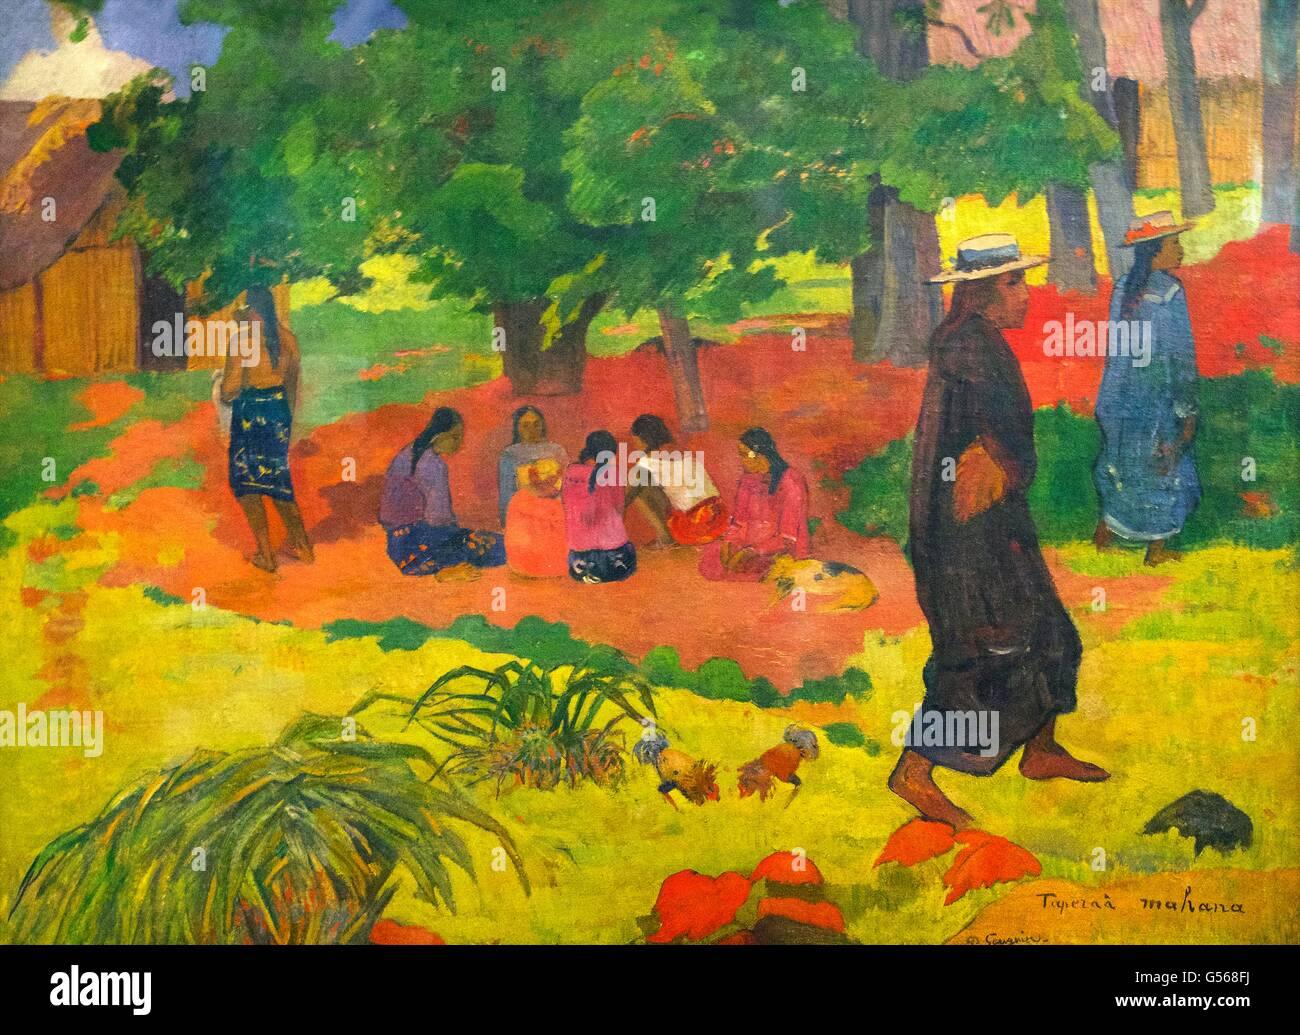 Taperaa Mahana, Late Afternoon, by Paul Gauguin, 1892, State Hermitage Museum, Saint Petersburg, Russia - Stock Image